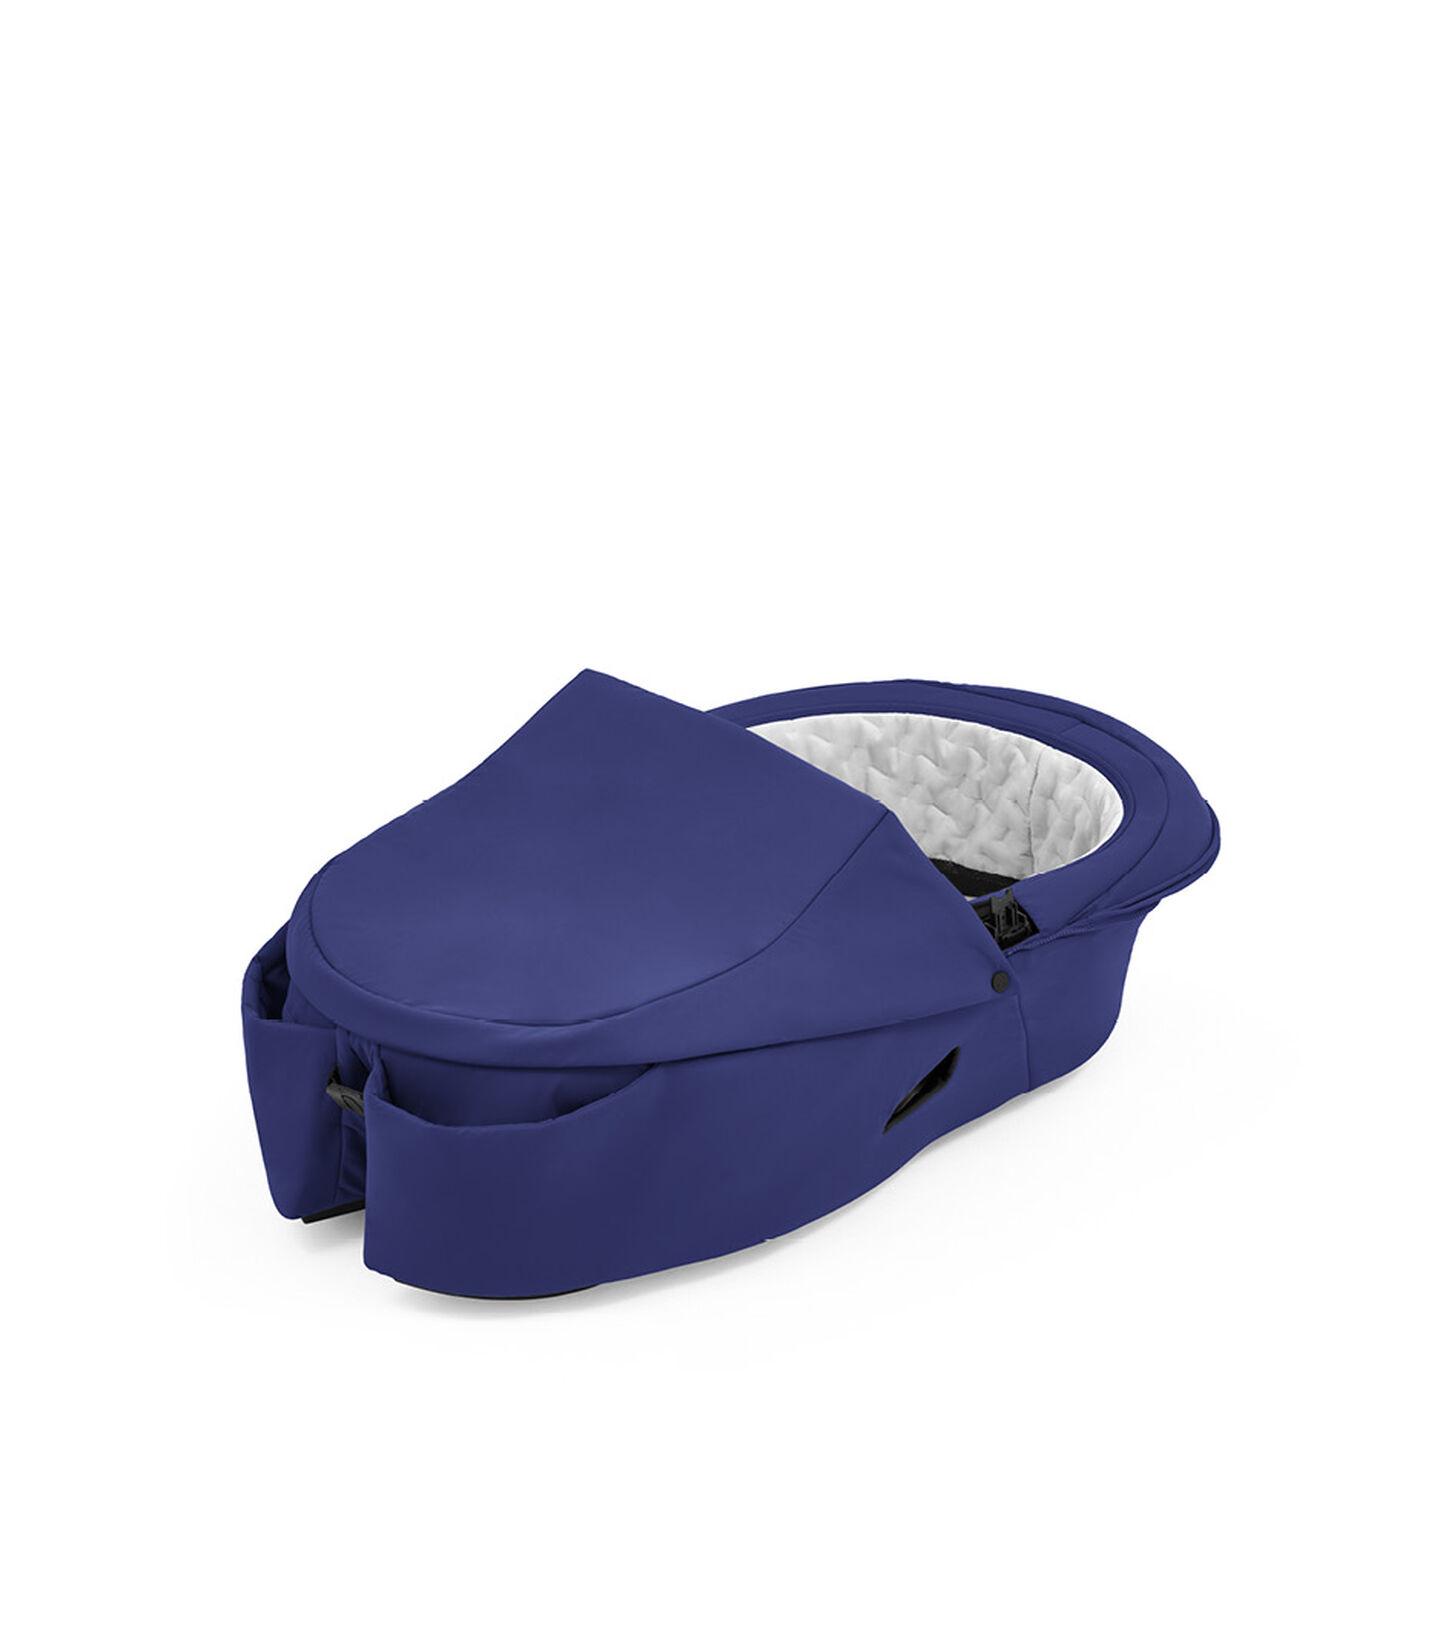 Stokke® Xplory® X Carry Cot Royal Blue, Royal Blue, mainview view 2